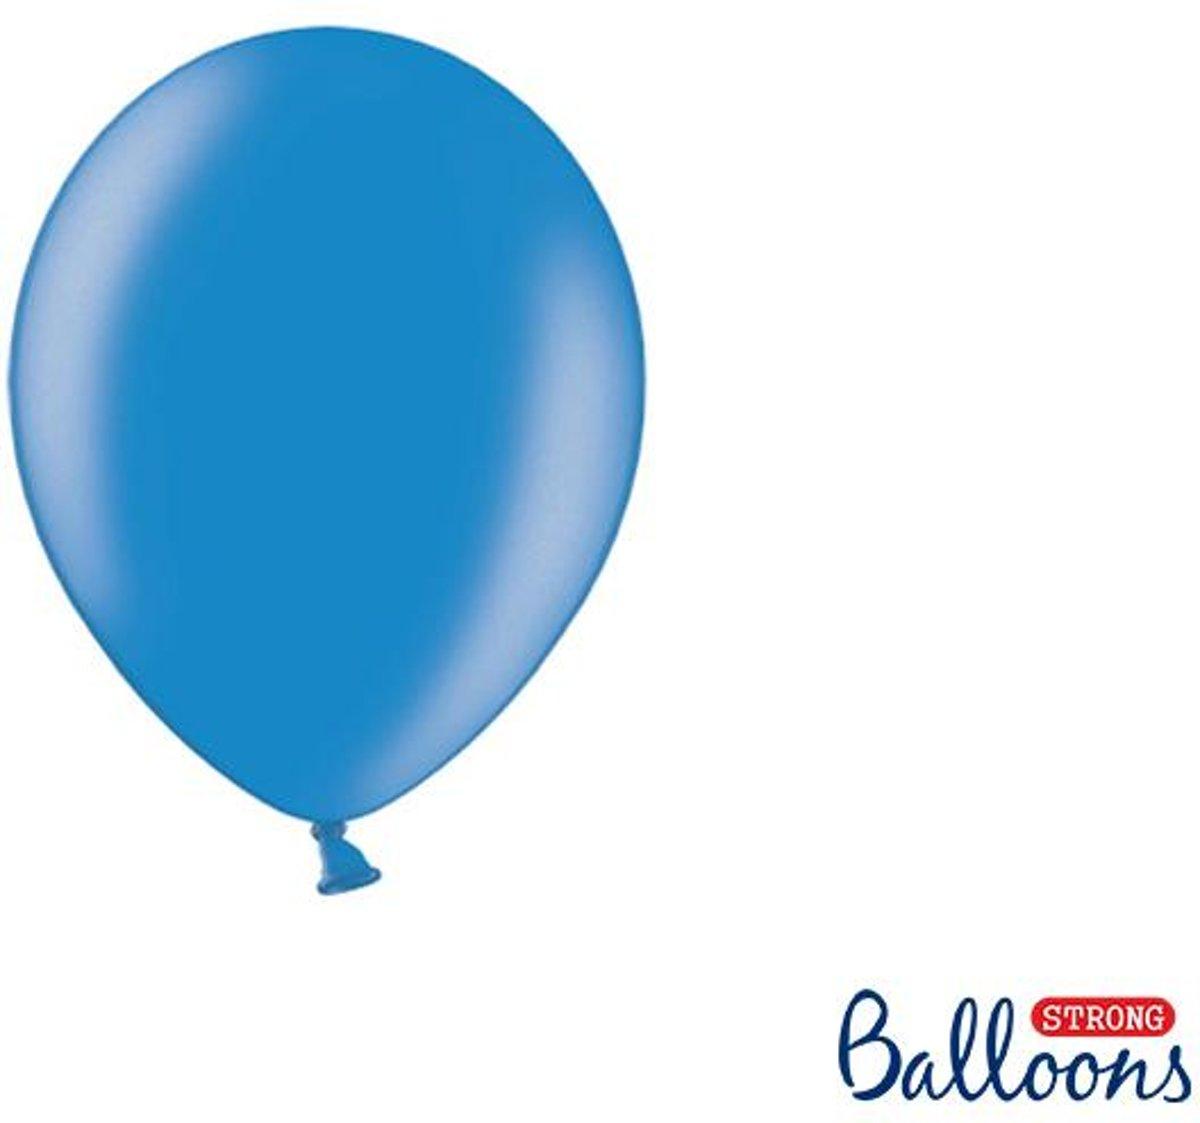 Strong Ballonnen 12cm, Metallic Cornflower blauw (1 zakje met 100 stuks)